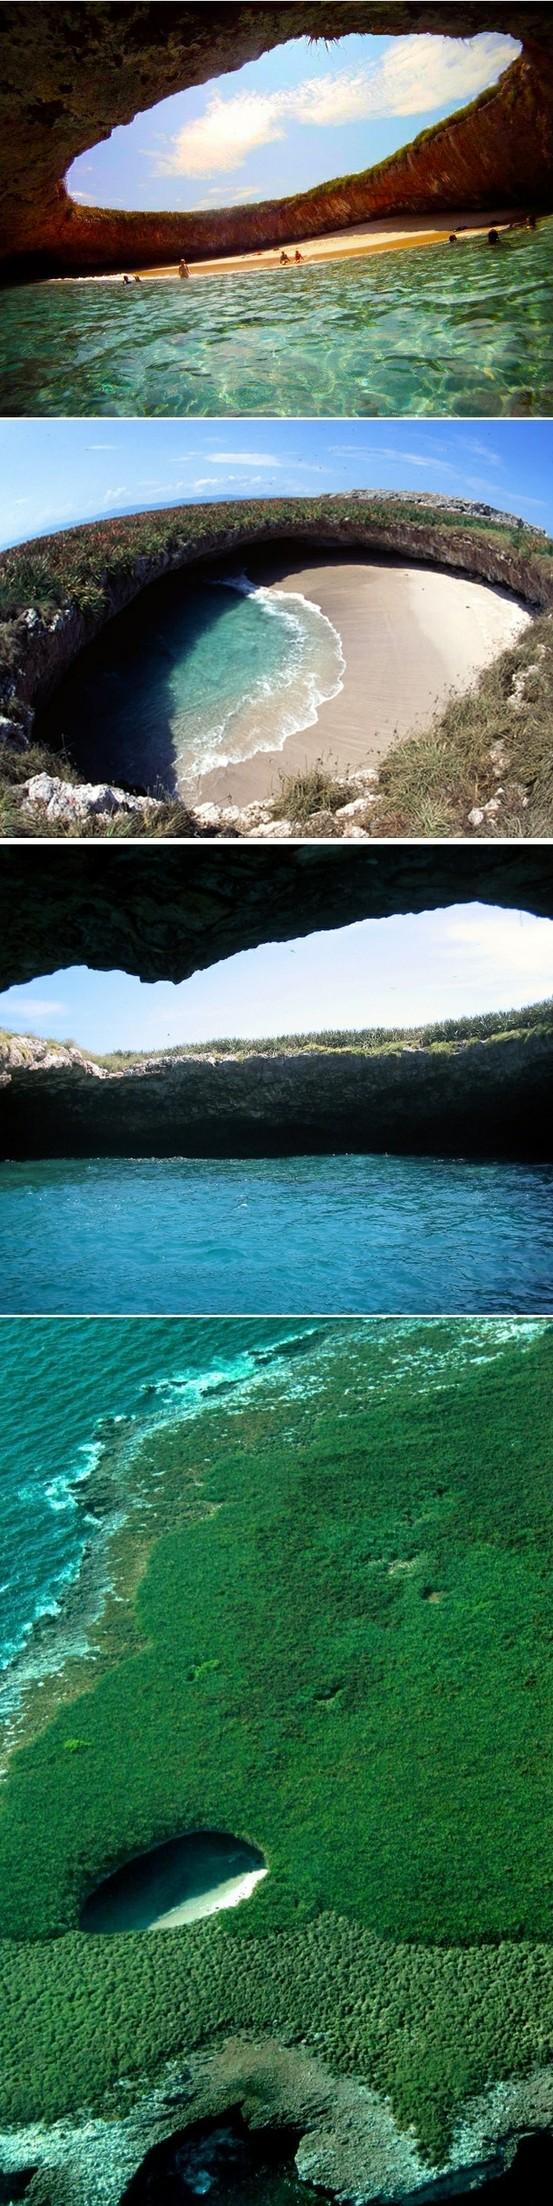 "Playa ""escondida"" - Islas Marietas - costa de Puerto Vallarte, Mexico - Explore the World with Travel Nerd Nici, one Country at a Time. http://TravelNerdNici.com"